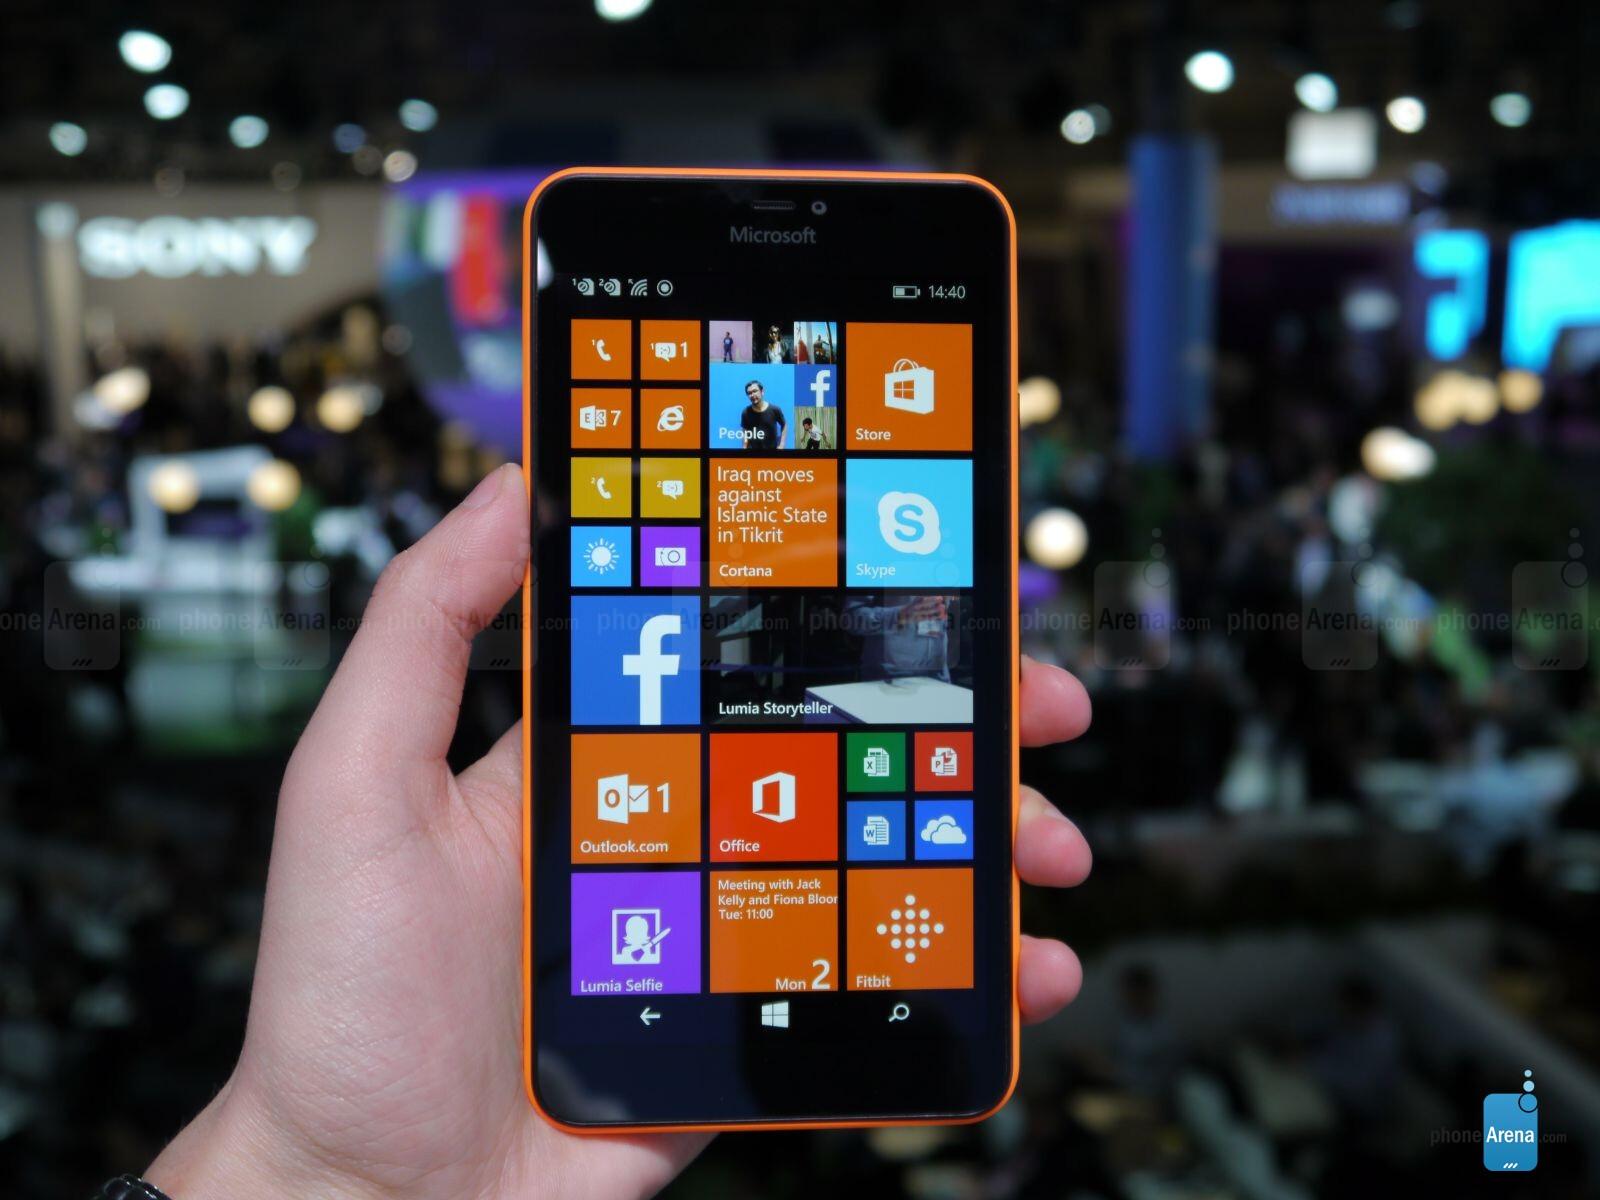 Microsoft Lumia 640 XL hands-on: a big budget Windows